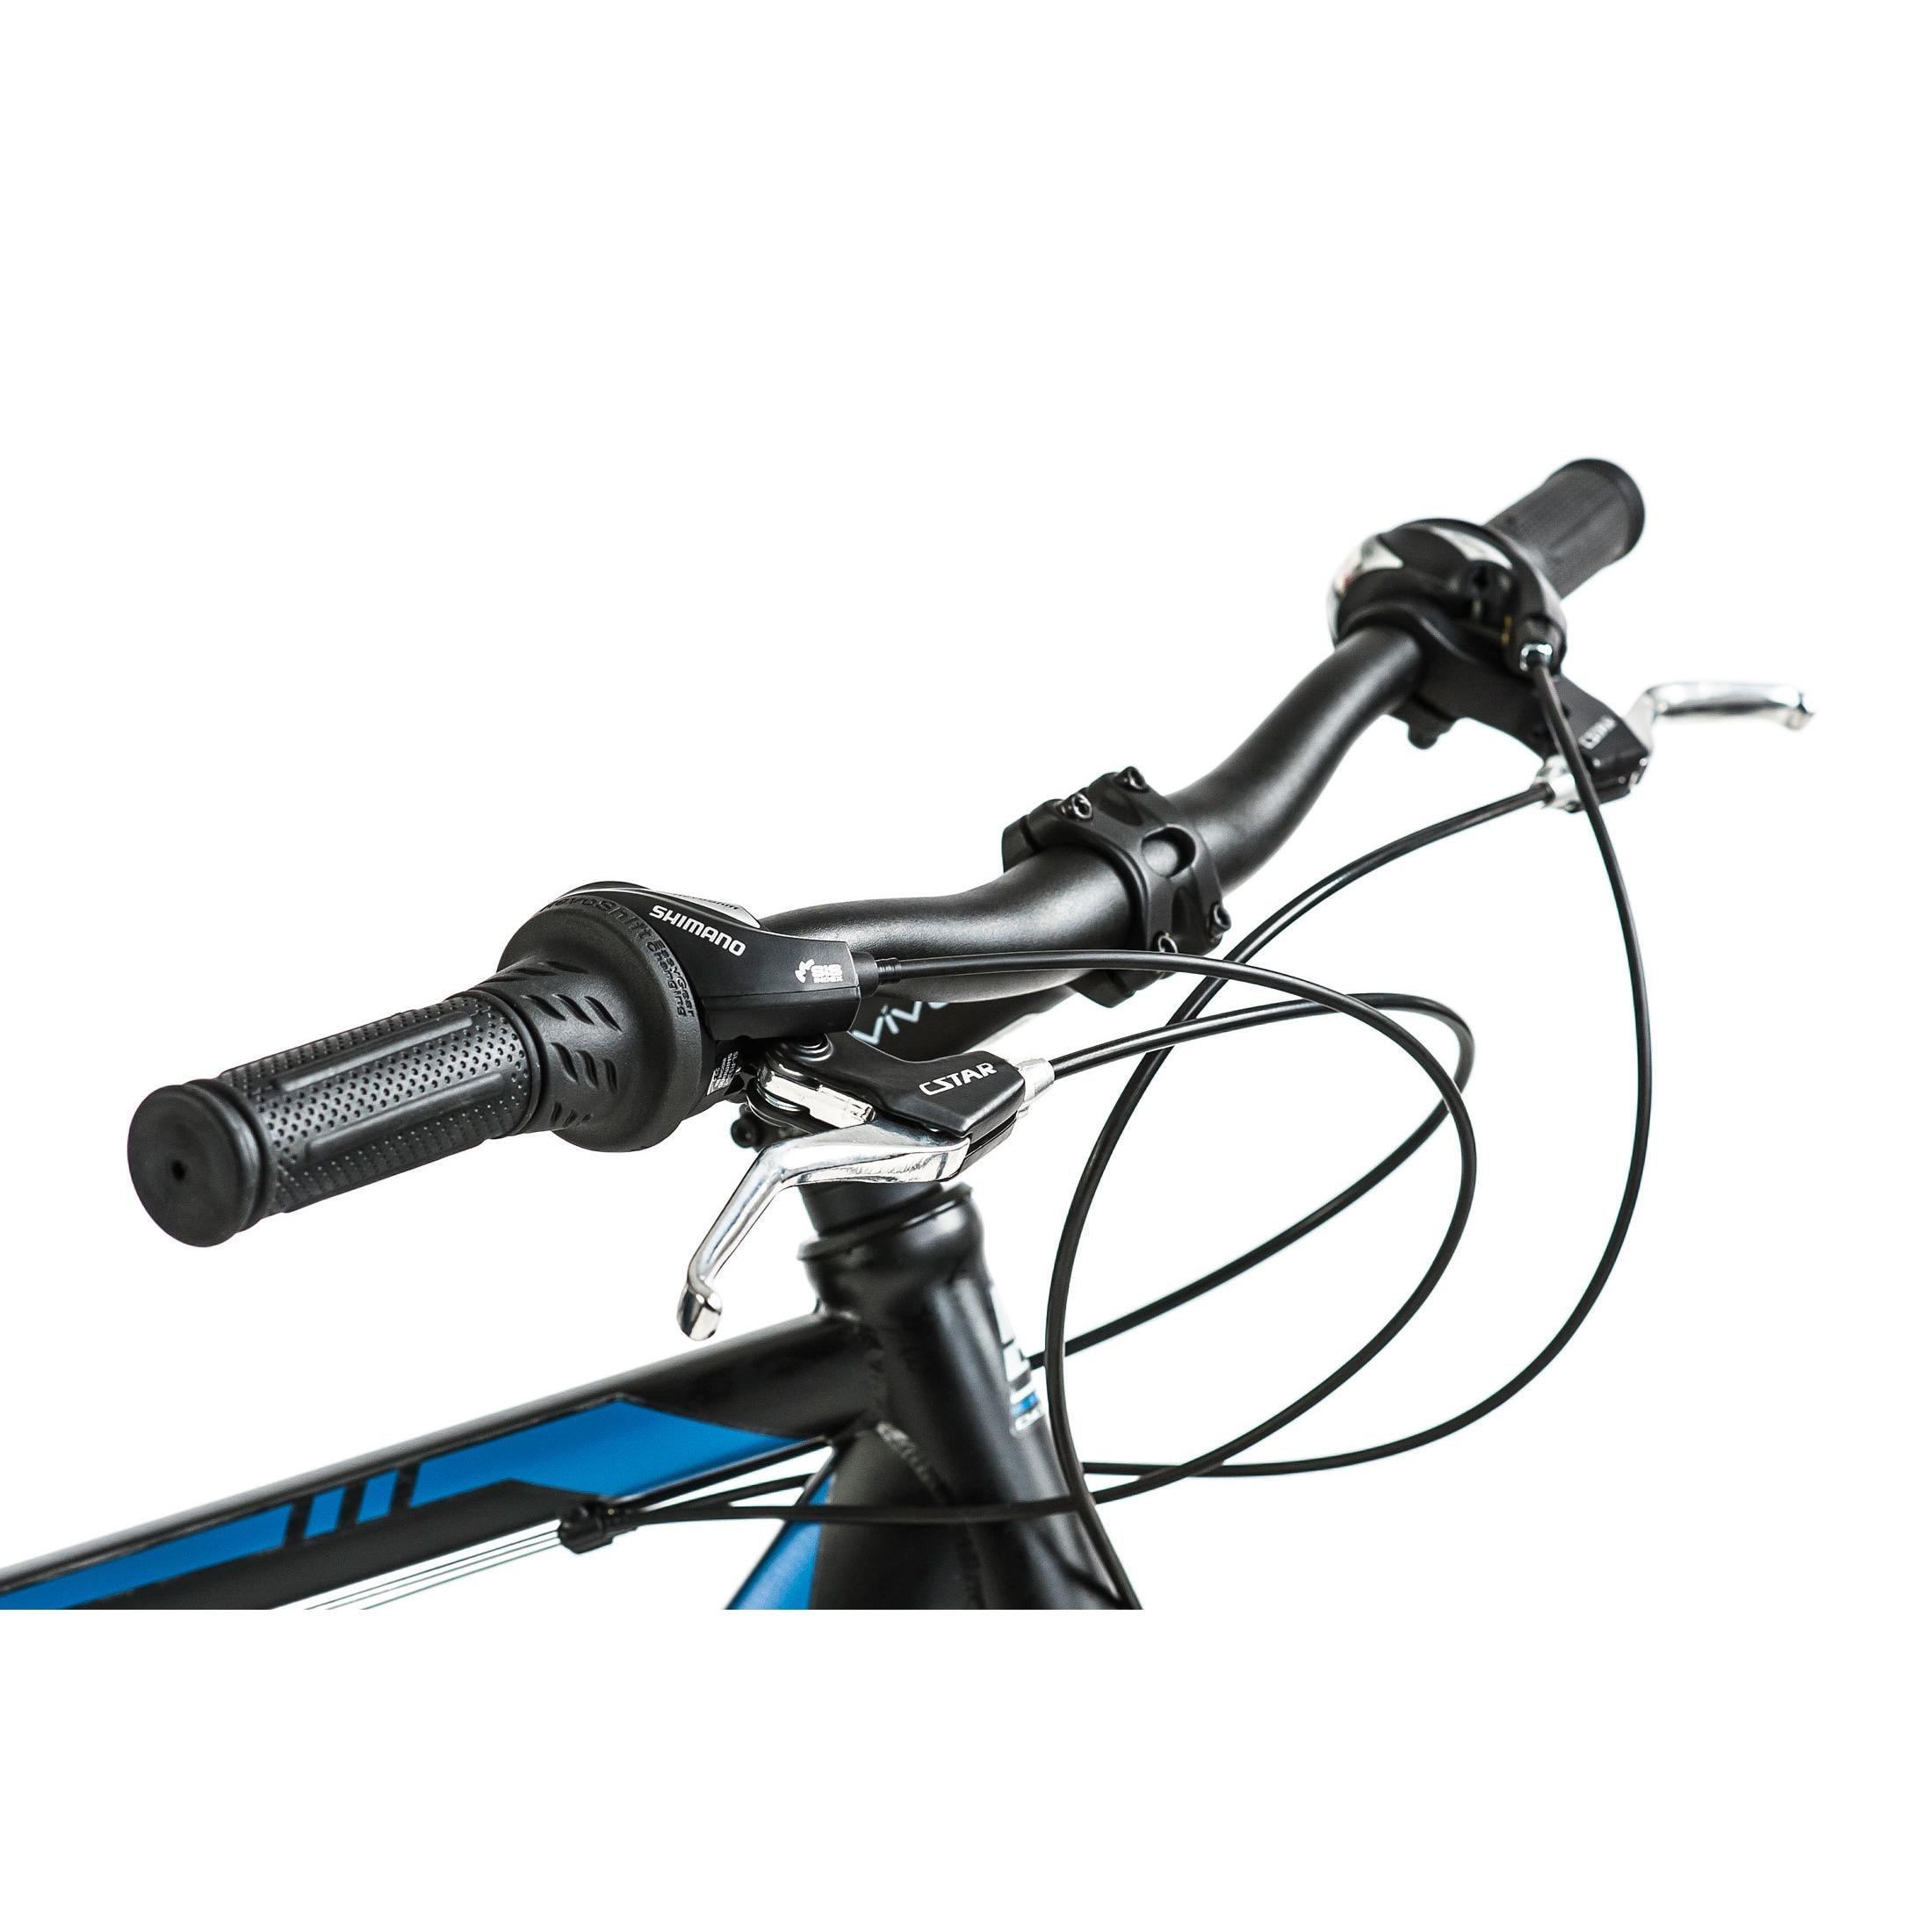 KS Cycling Mountainbike Hardtail 21 Gänge Sharp 27,5 Zoll